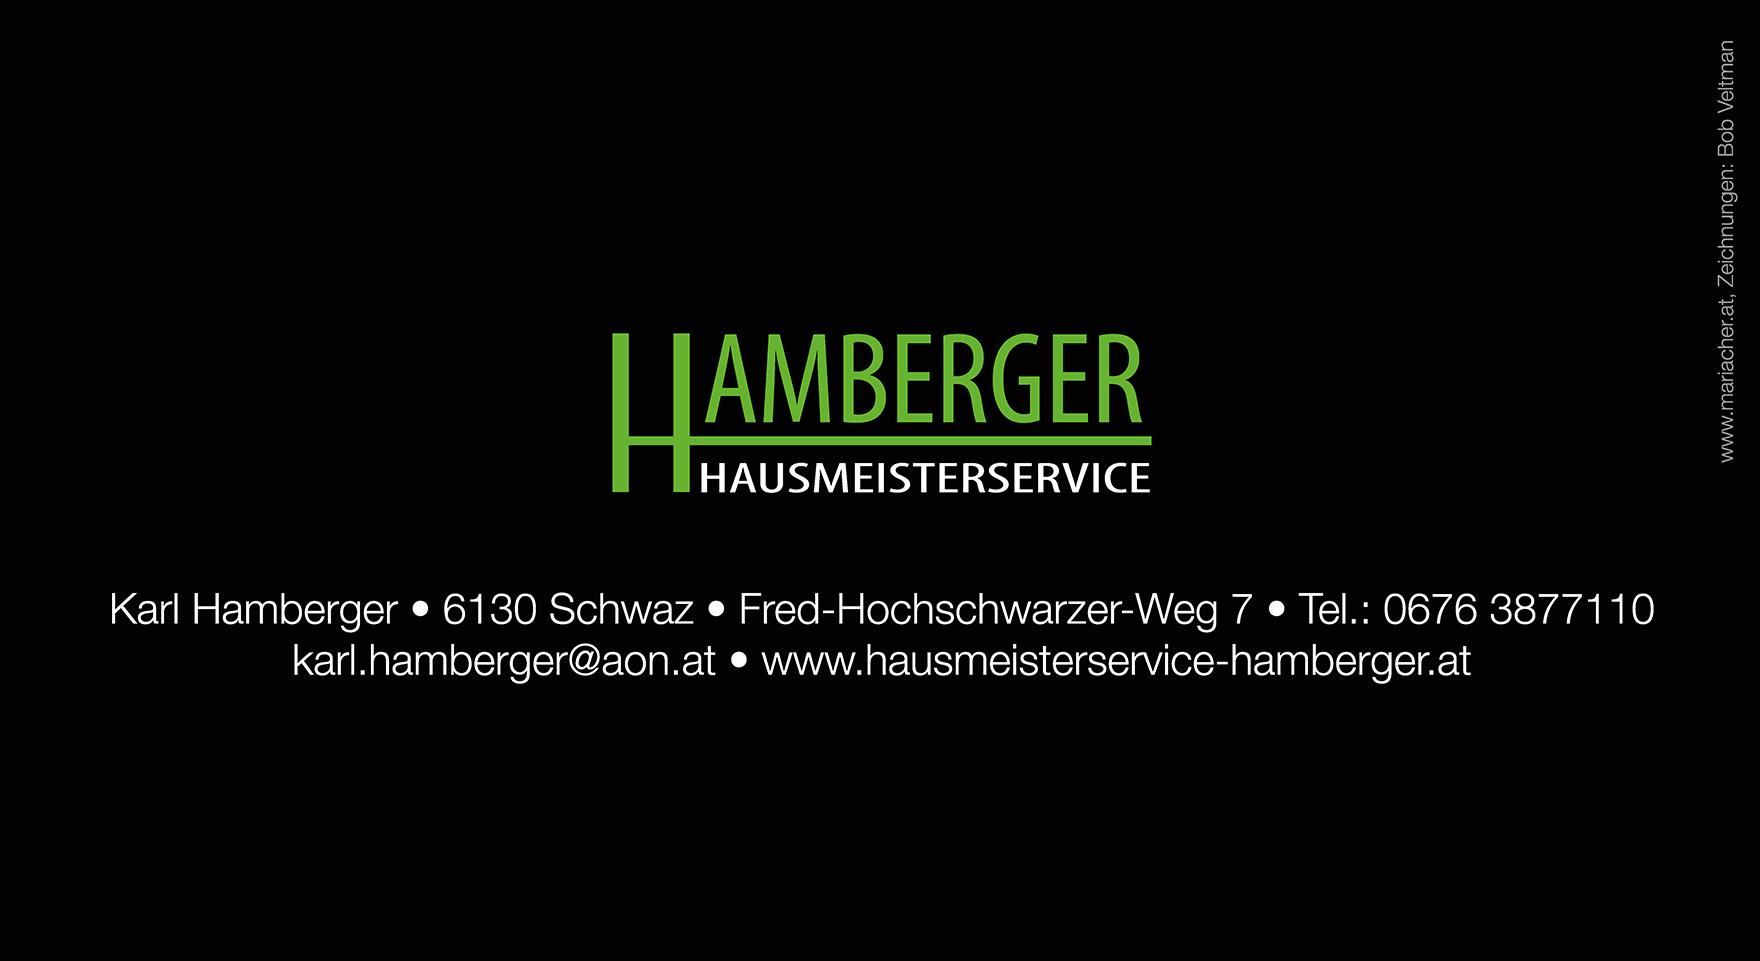 Kontakt Hamberger Hausmeisterservice Schwaz